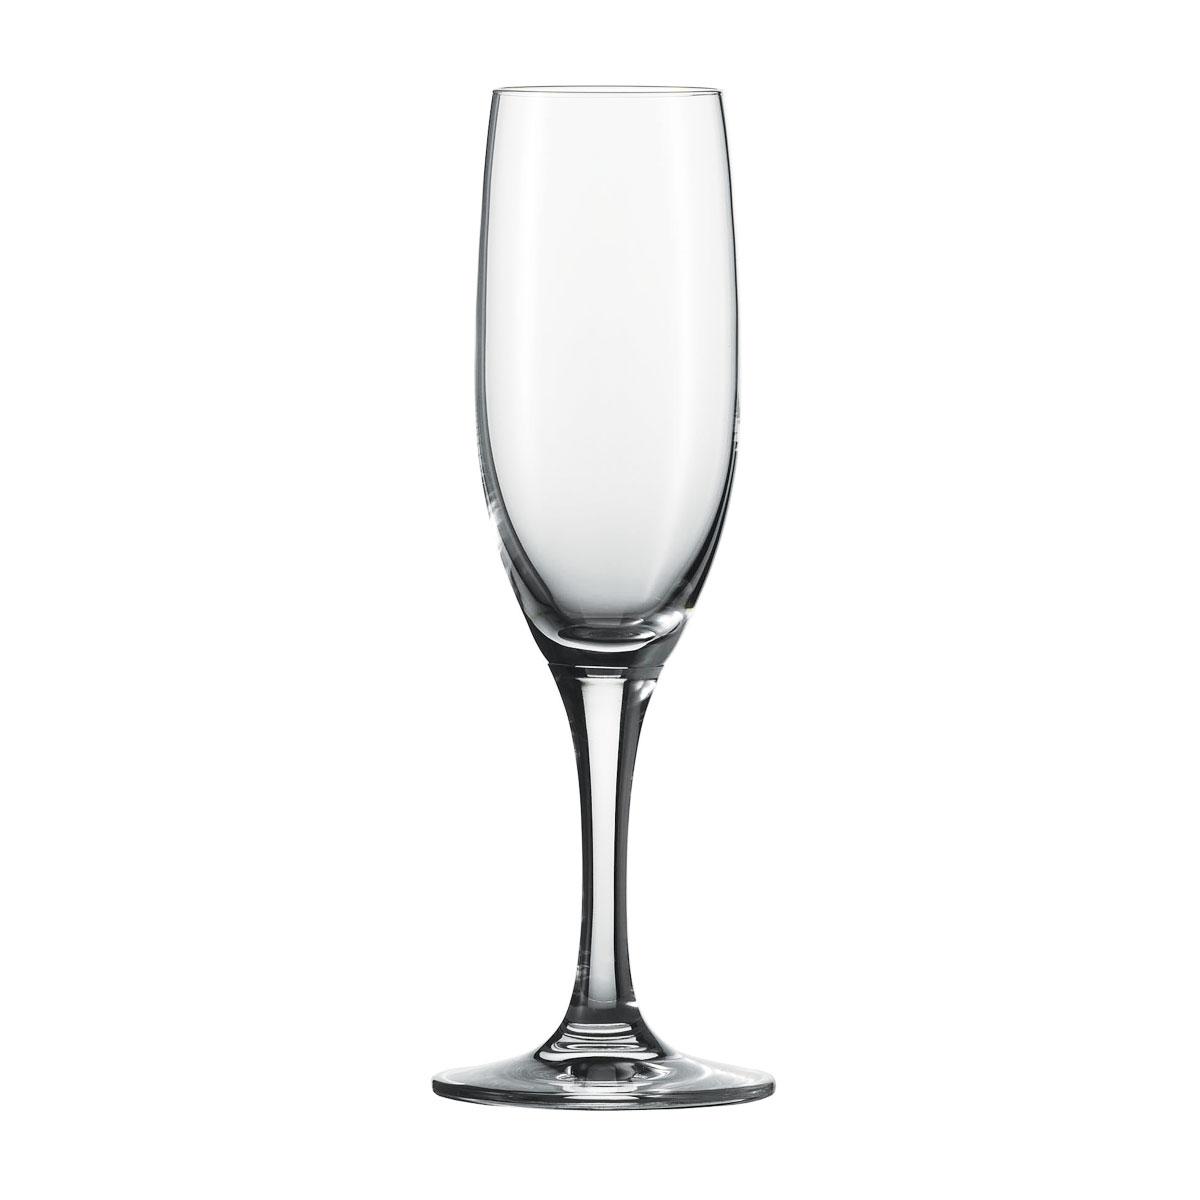 Schott Zwiesel Tritan Crystal, Mondial Crystal Flute Crystal Champagne, Single